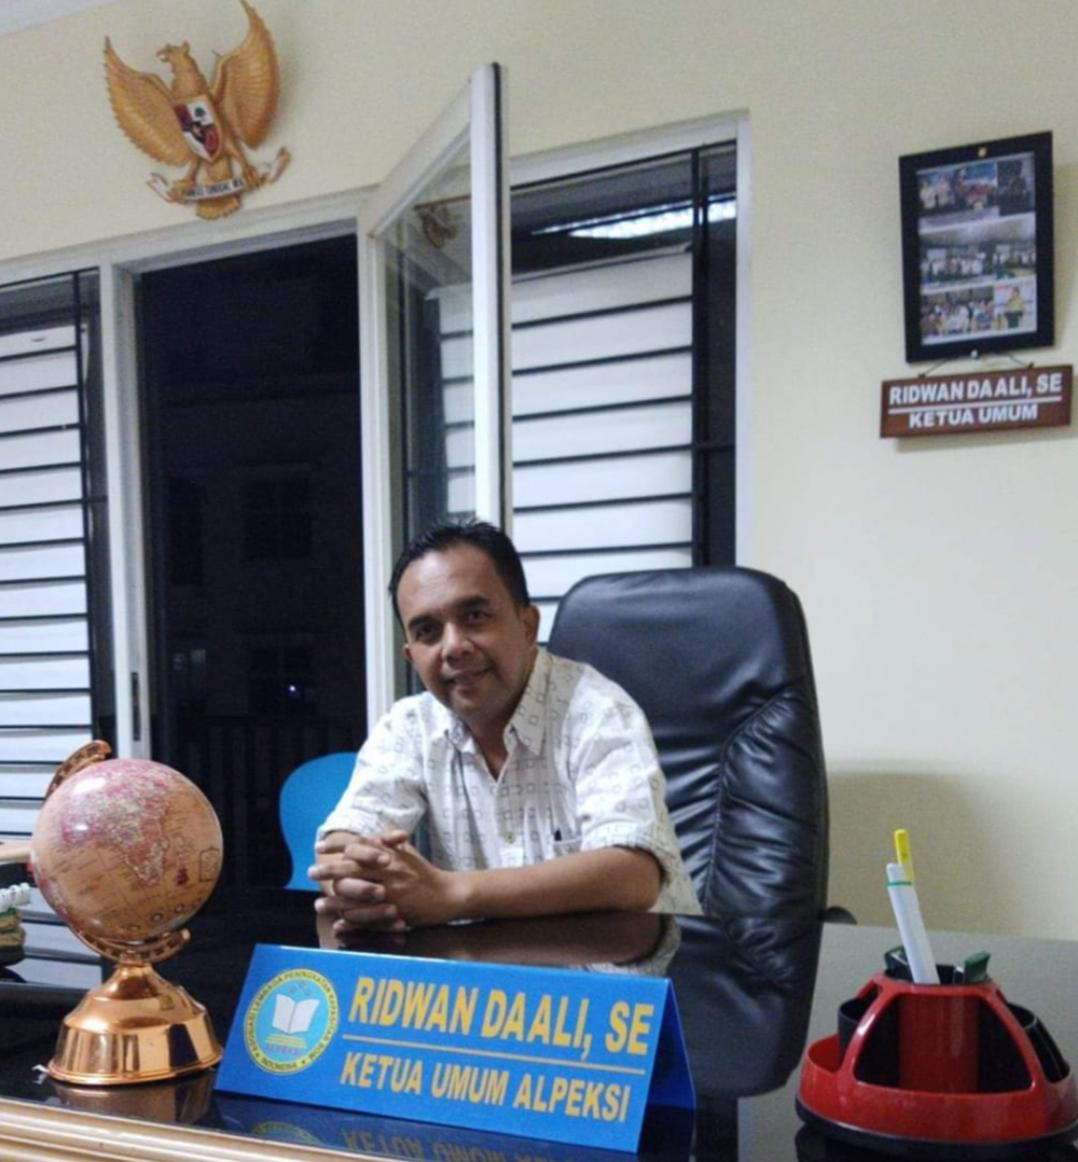 Ridwaan Daali Ketua Umum ALPEKSI Dinilai Layak Menjadi Menteri PDTT di Kabinet Presiden Jokowi